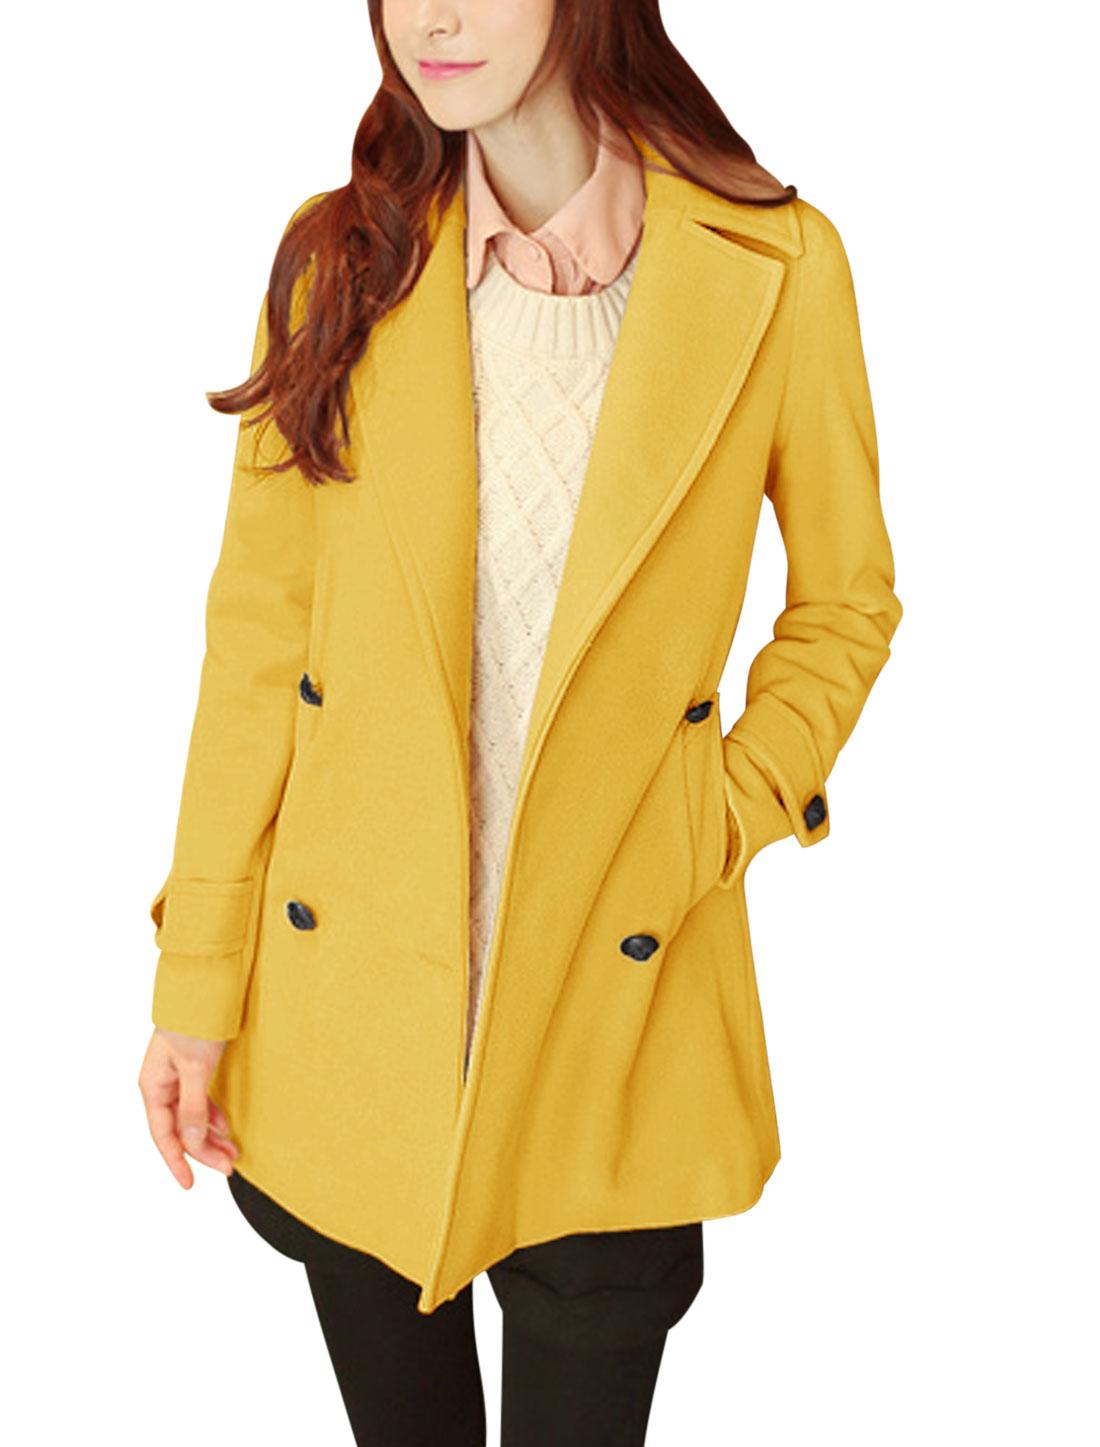 Women Notched Lapel Long Sleeve Fashion Worsted Coat Yellow M